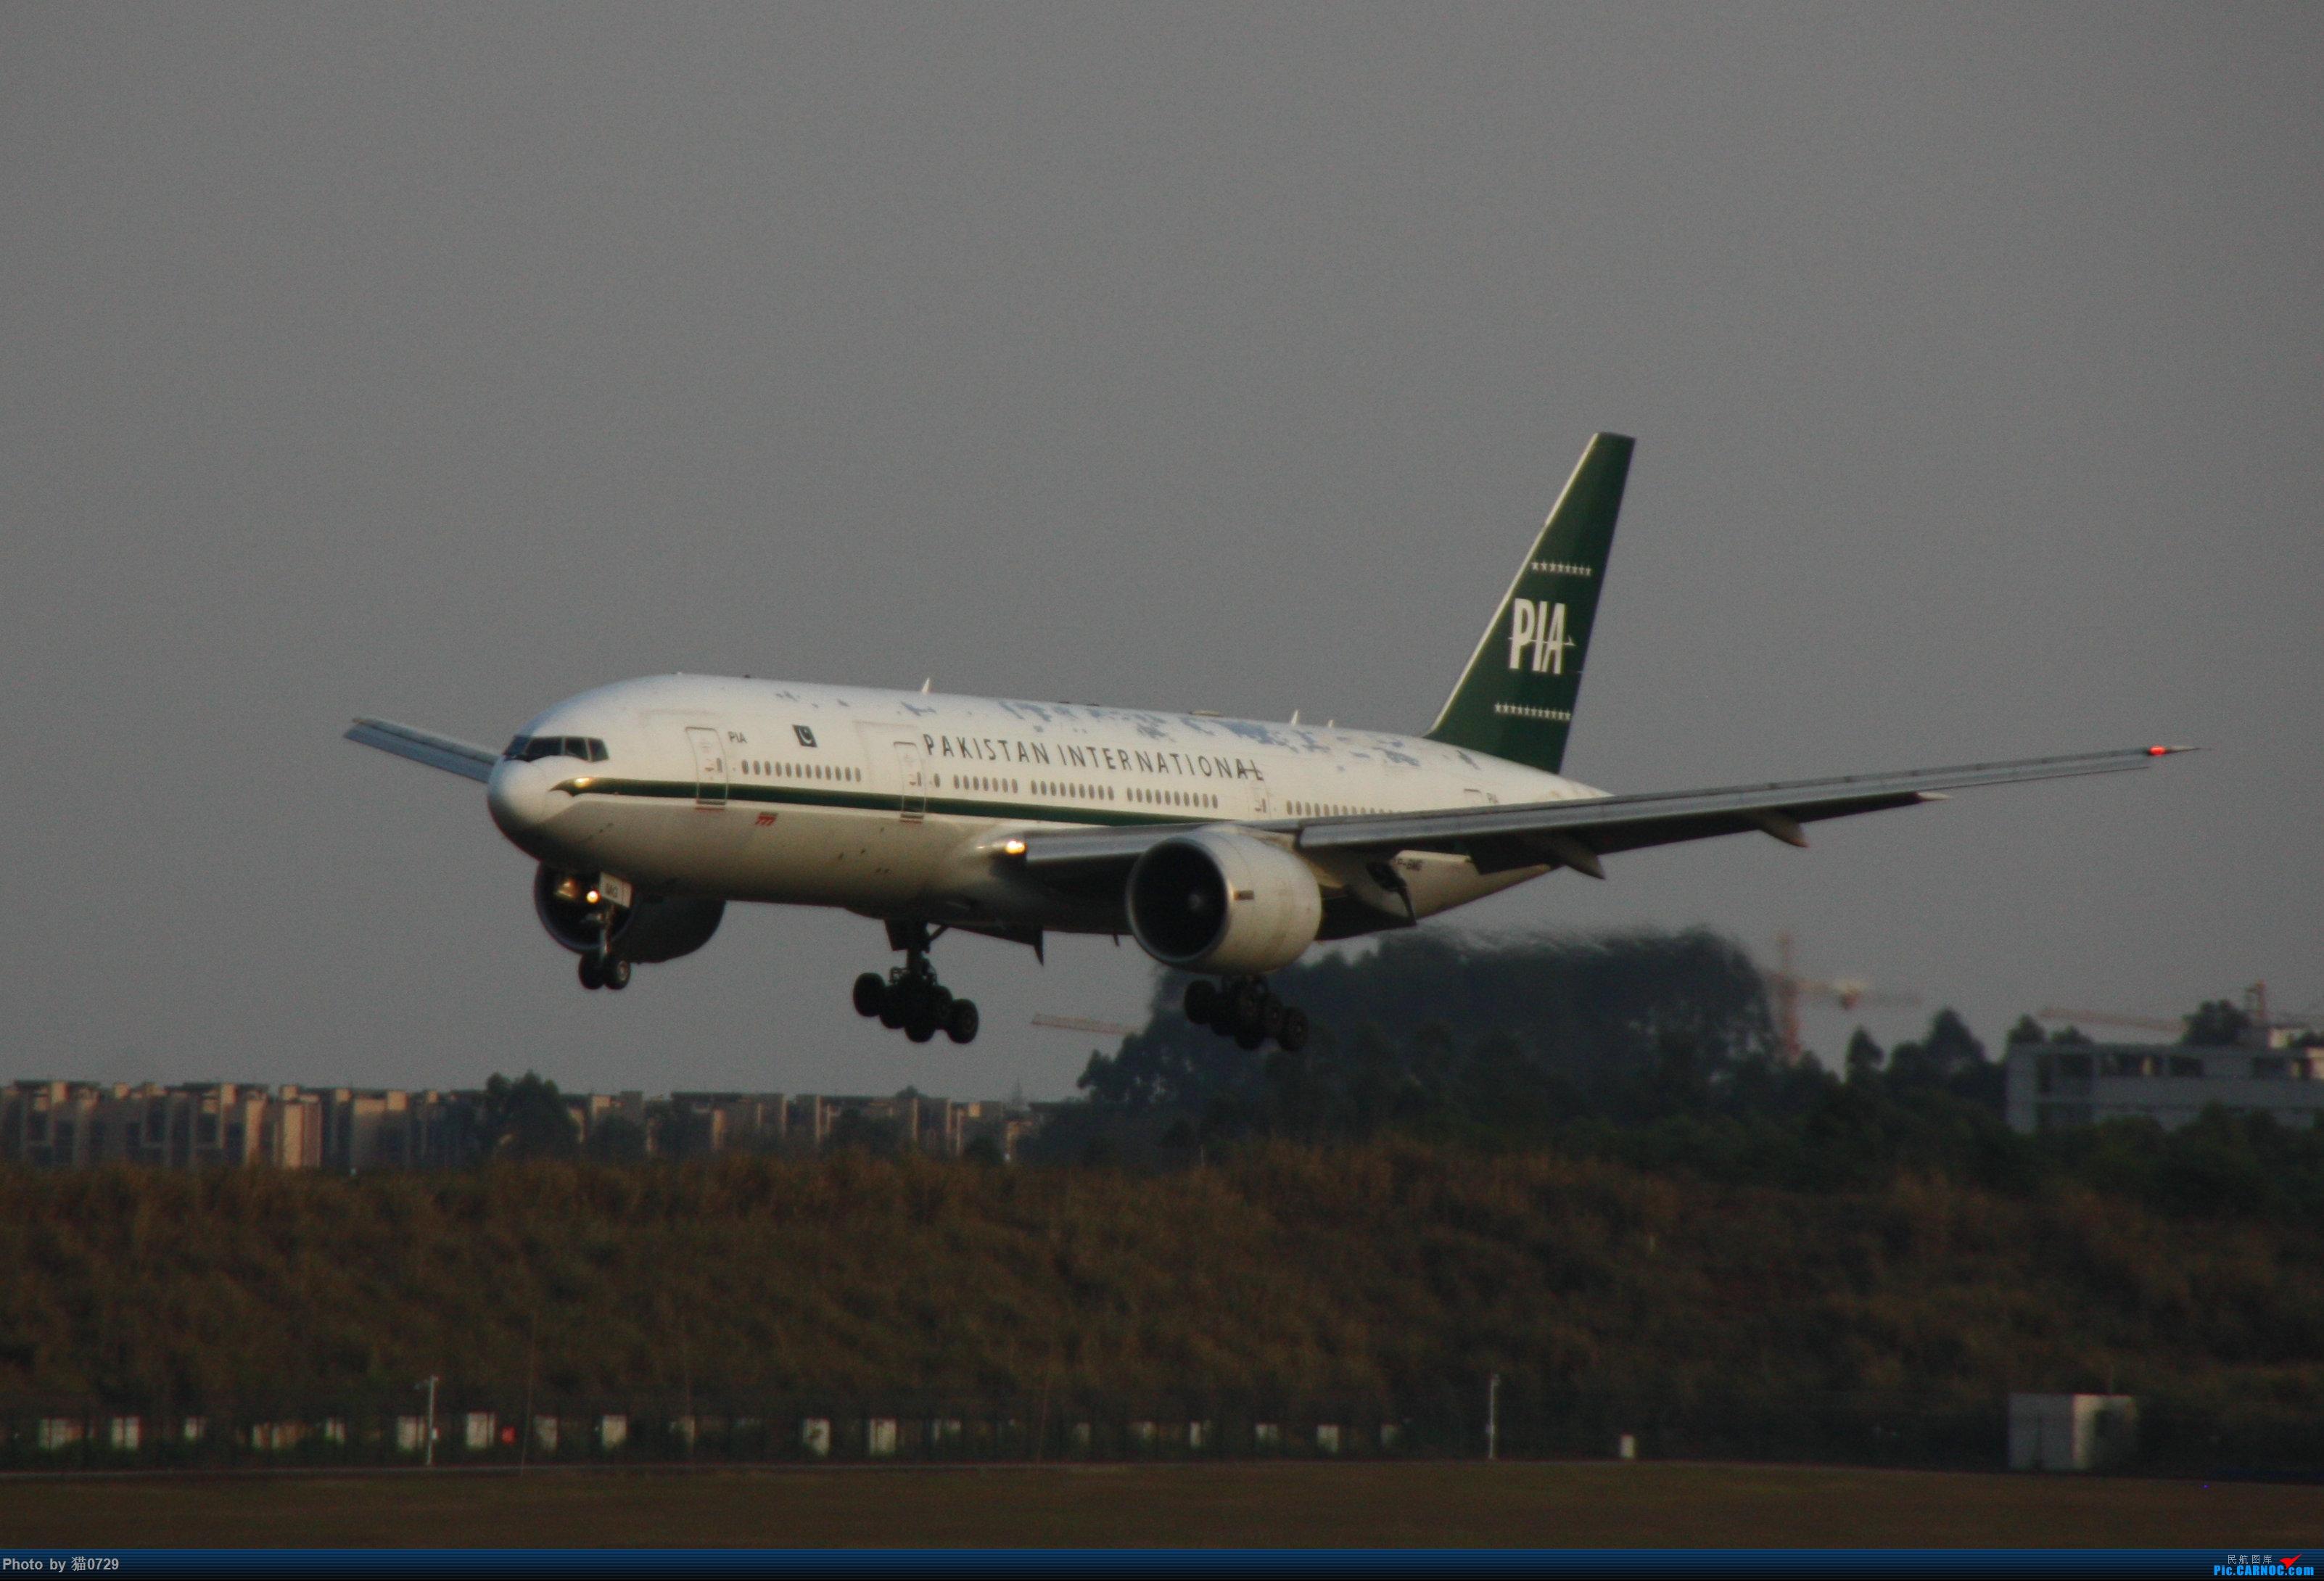 Re:[原创]CTU 119.425 水泥 伊朗346 巴基斯坦777 BOEING 777  中国成都双流国际机场